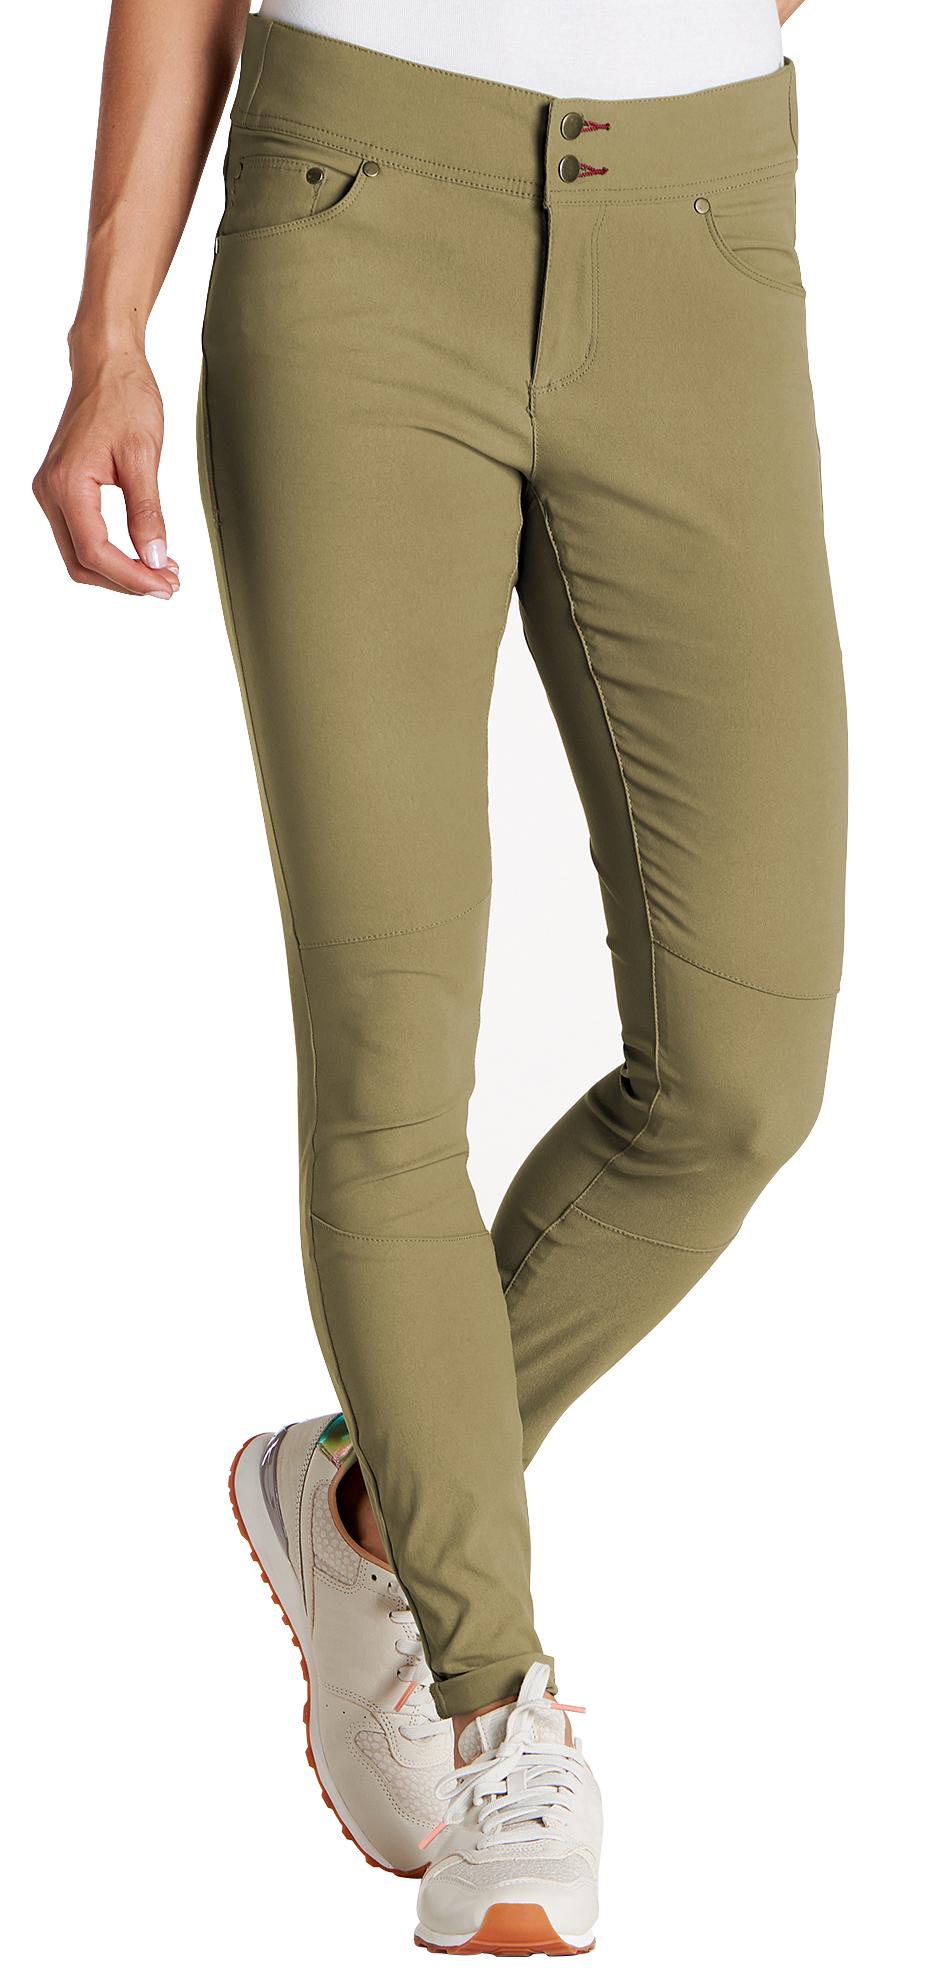 Toad Flextime Pantalon Skinny And Latulippe Pour Femme Co P8OZH